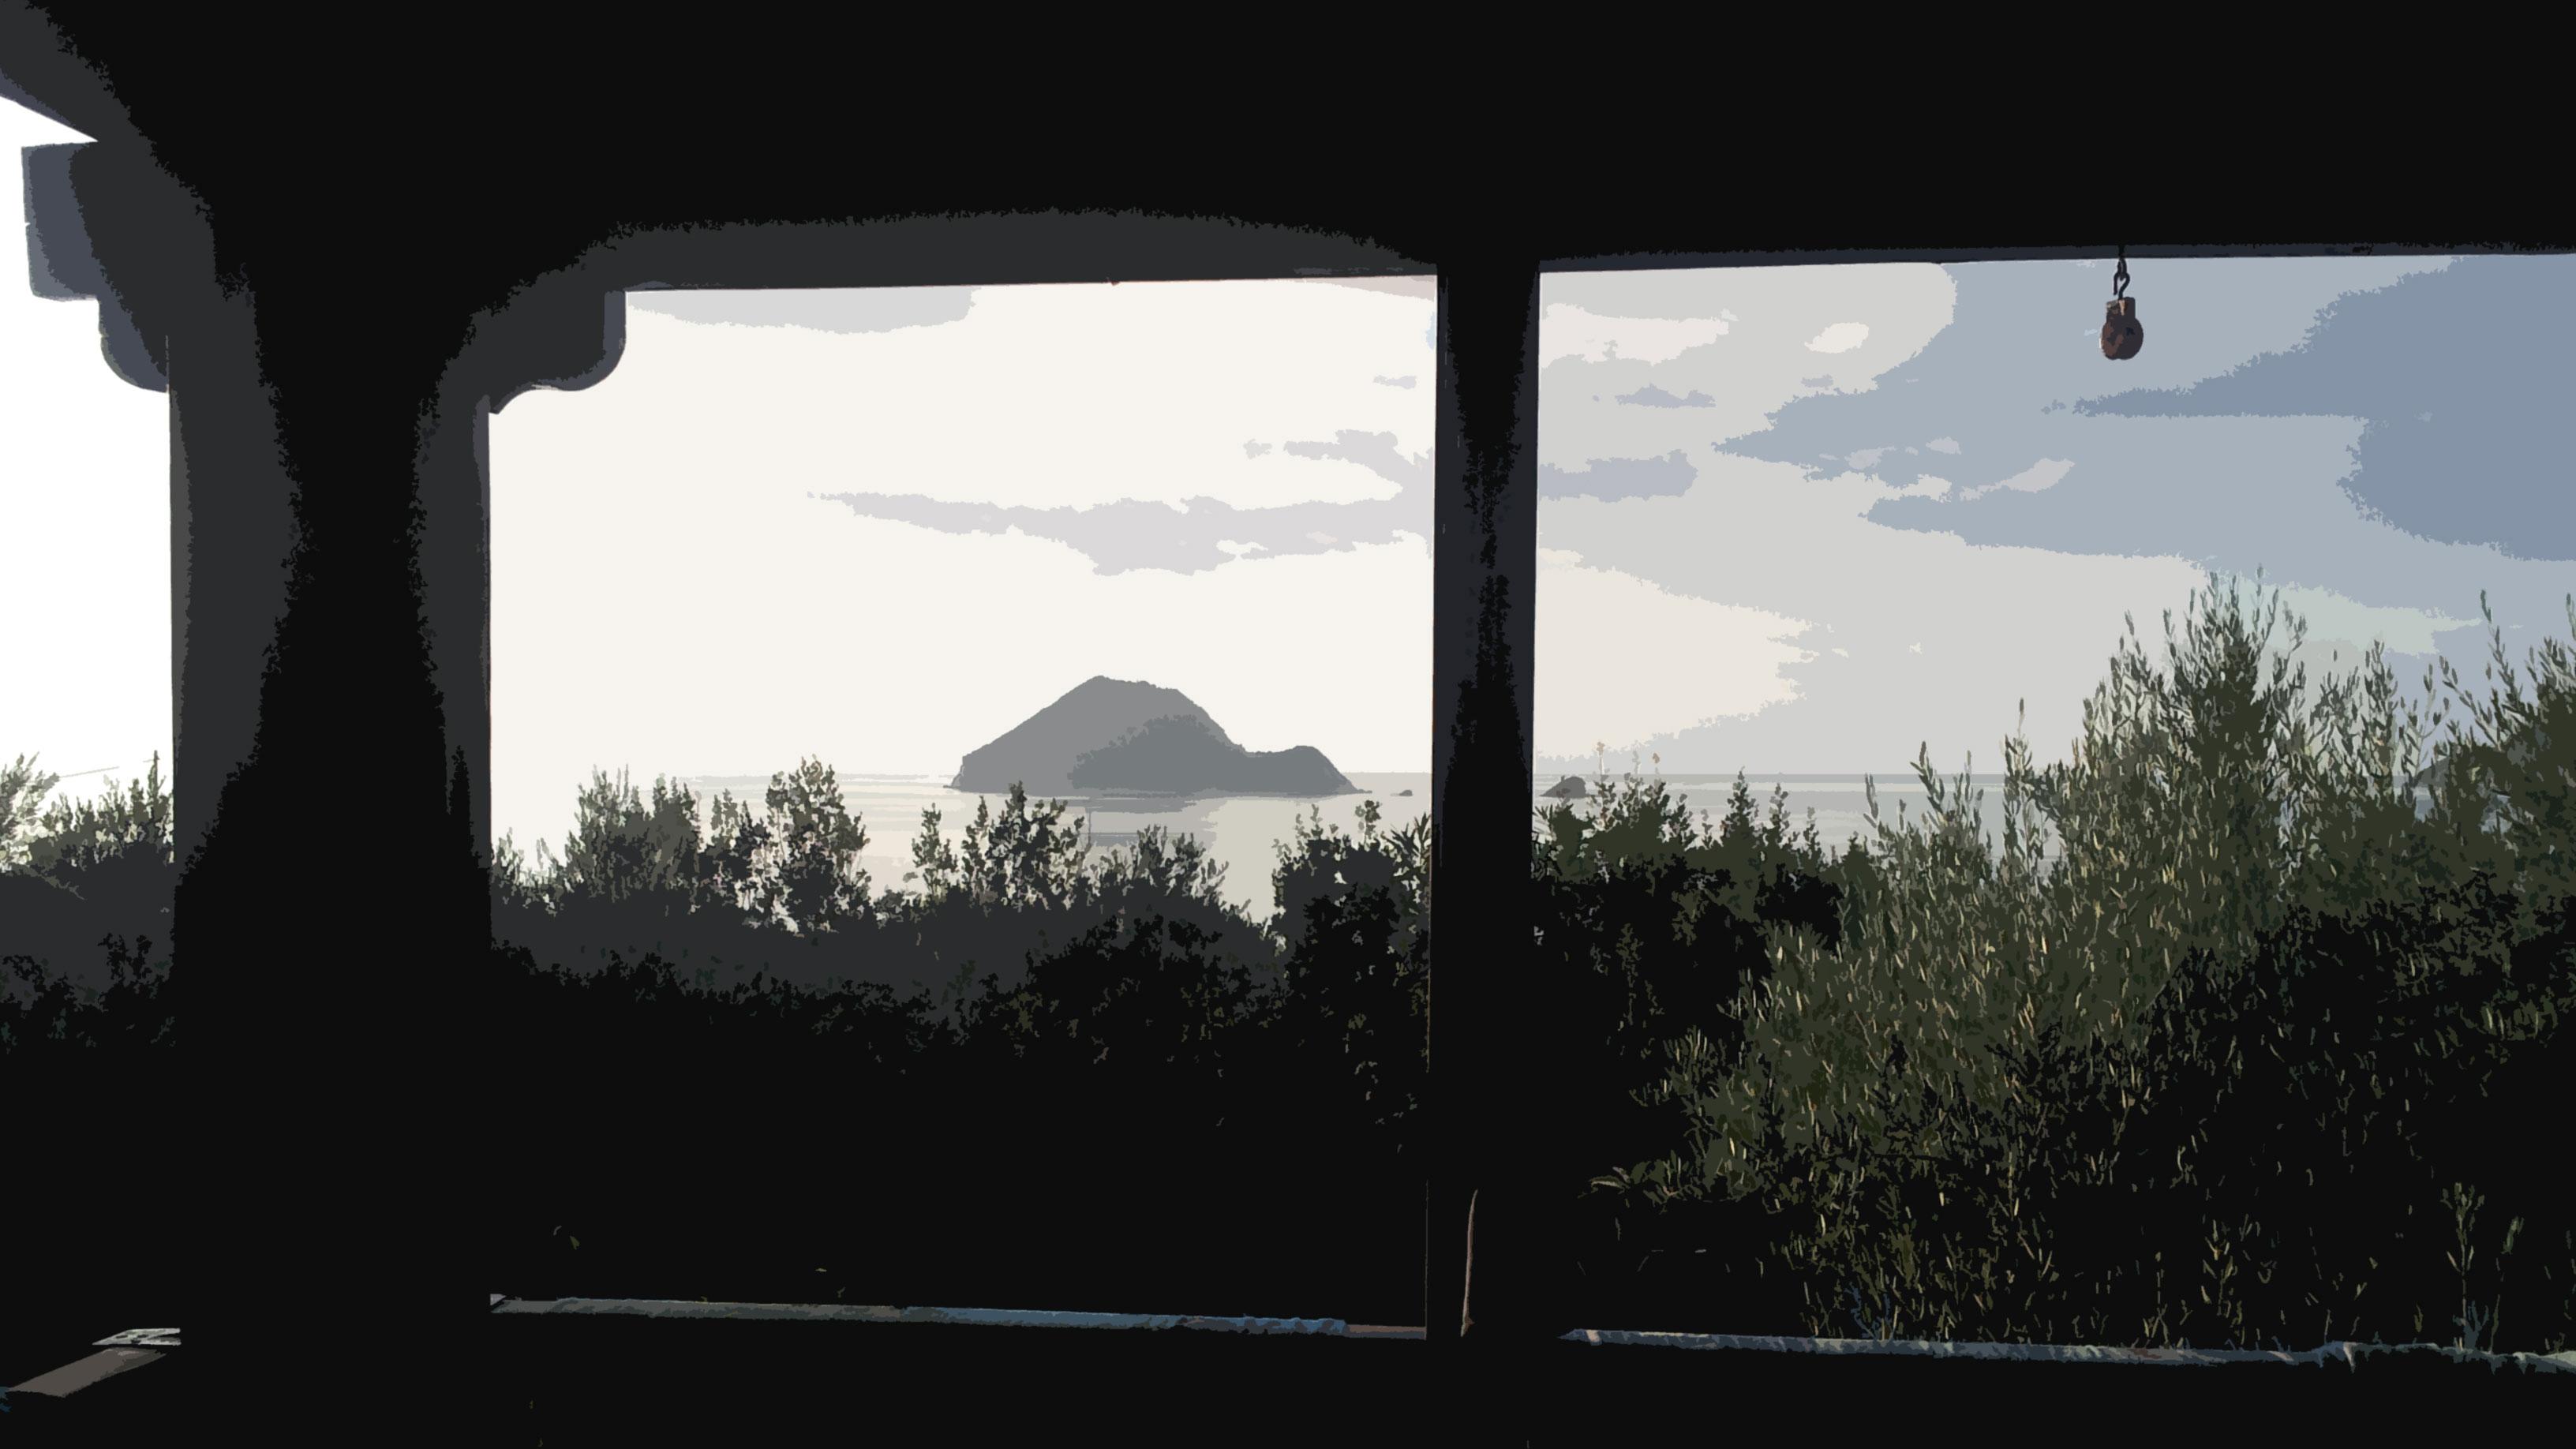 balkonfotoInsel-Kopie